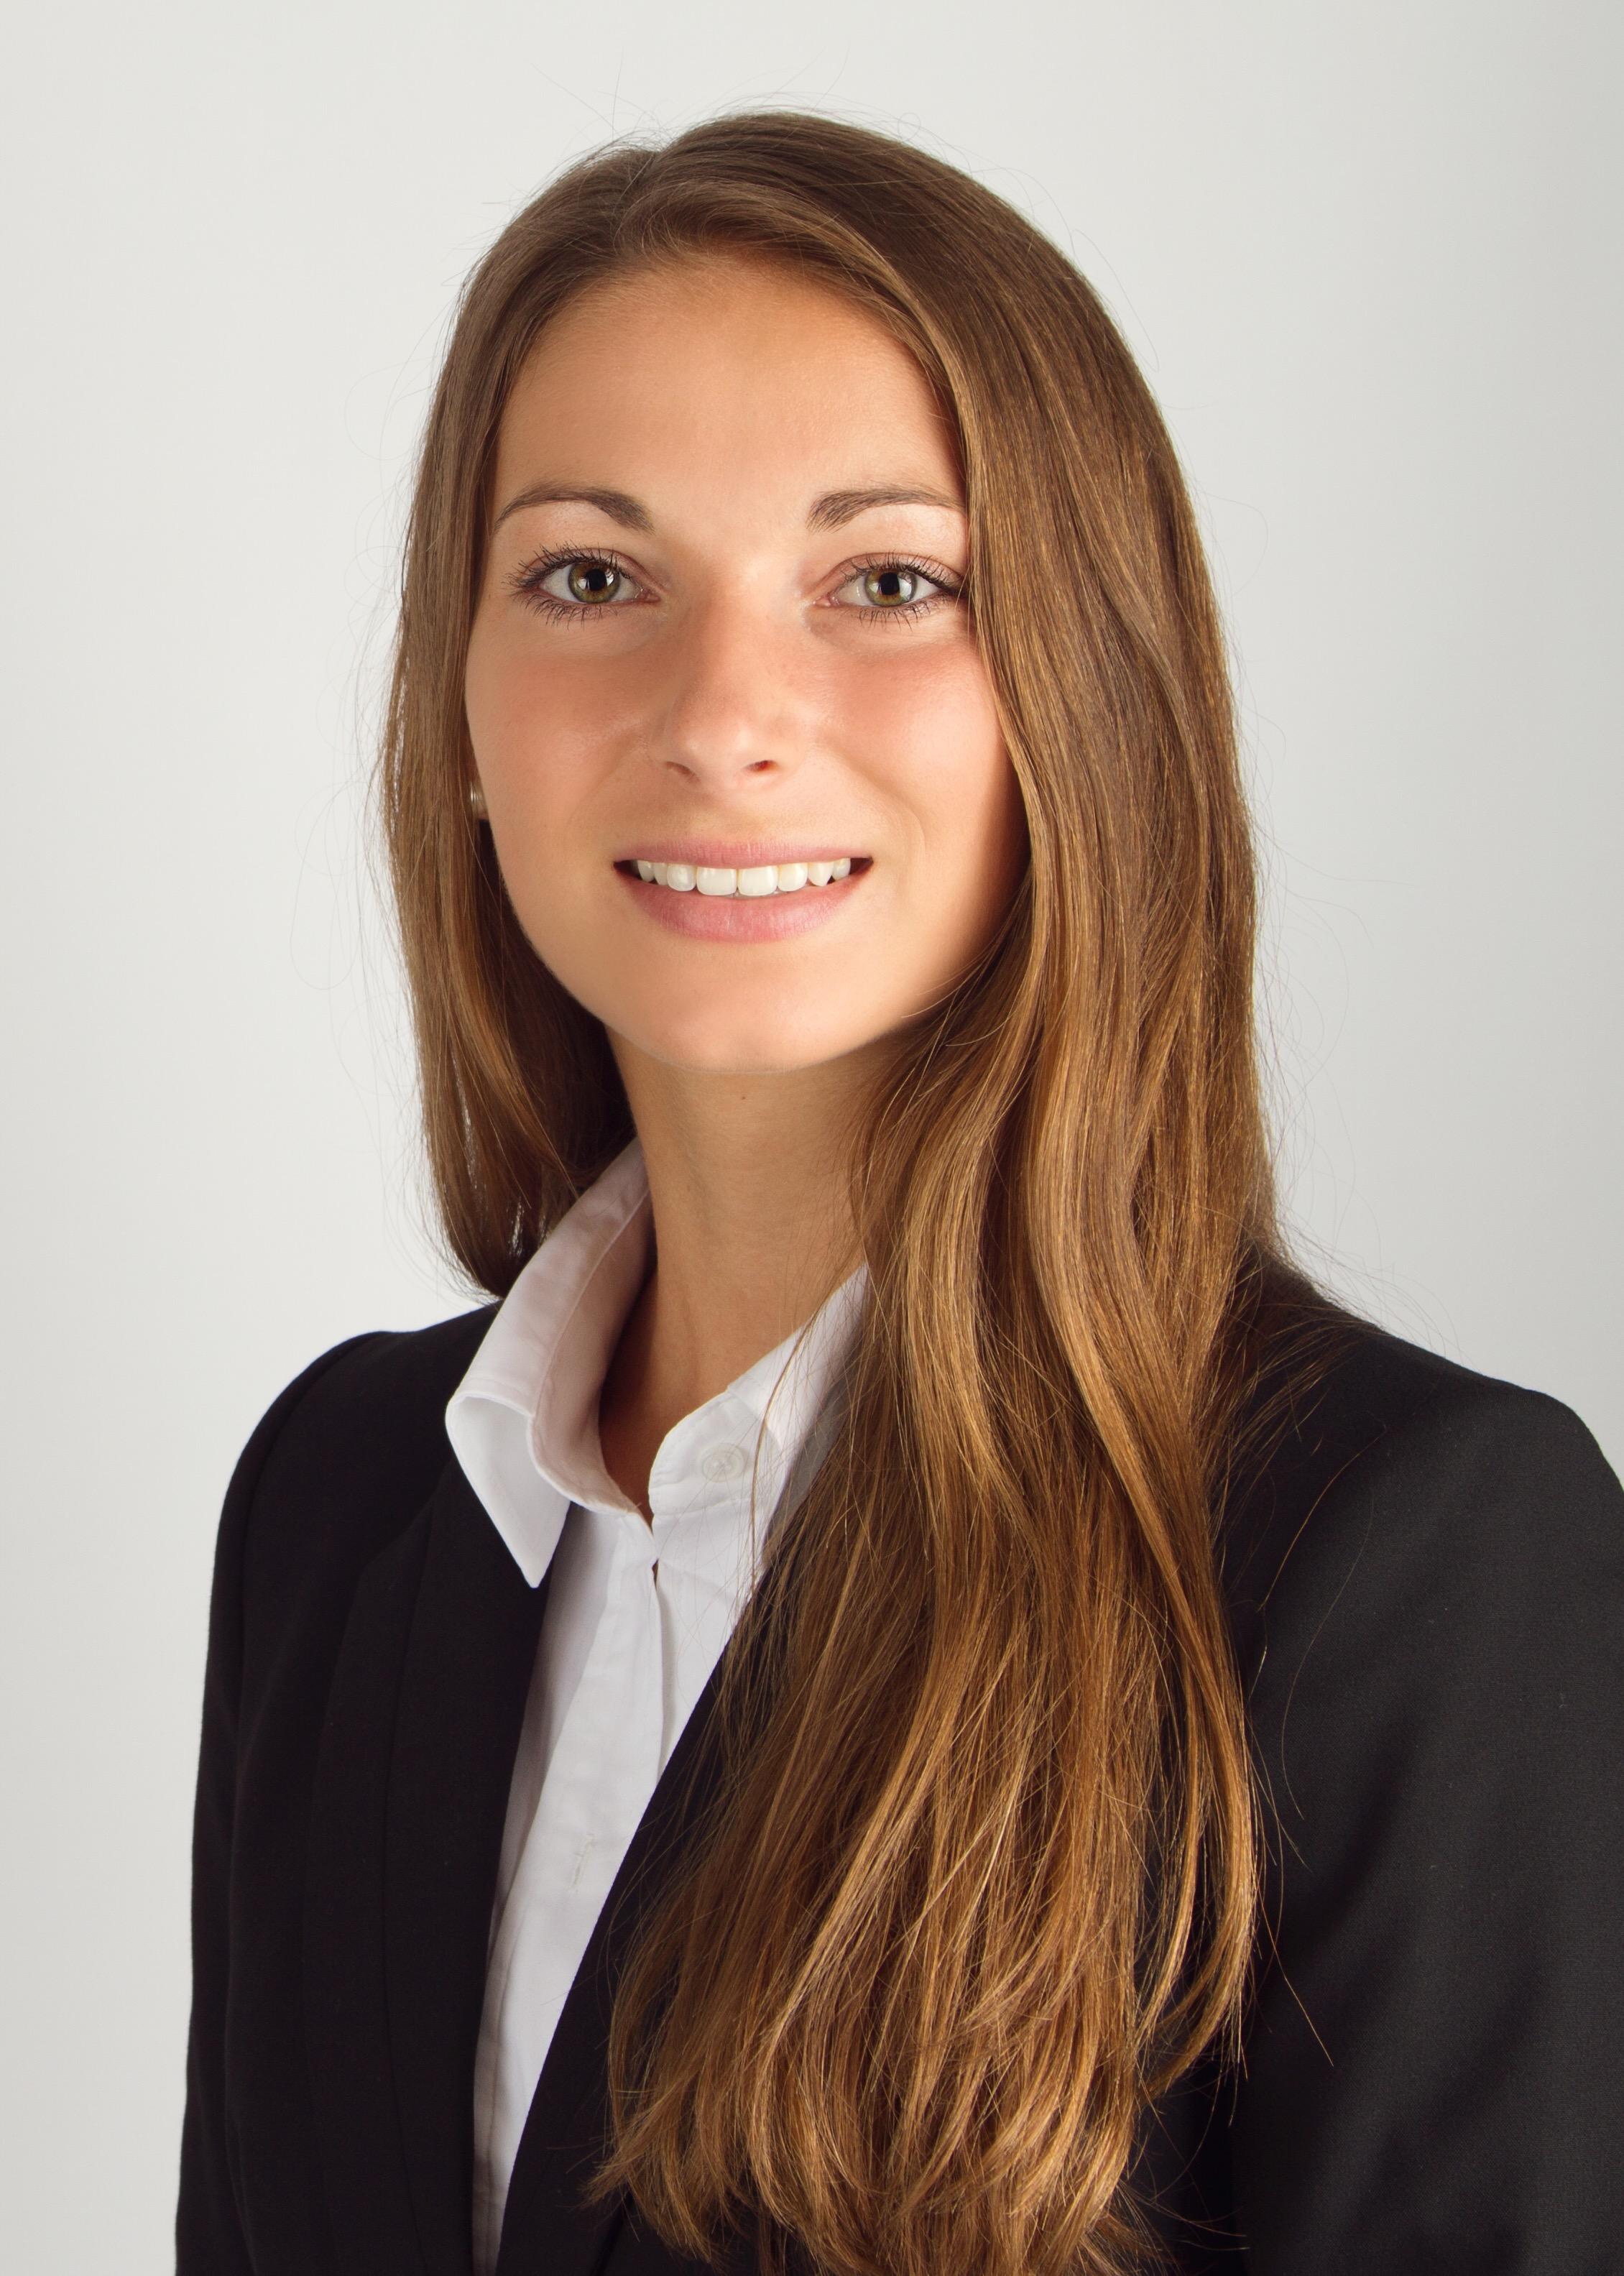 Janine Weinreich - MSc Marketing and Innovation